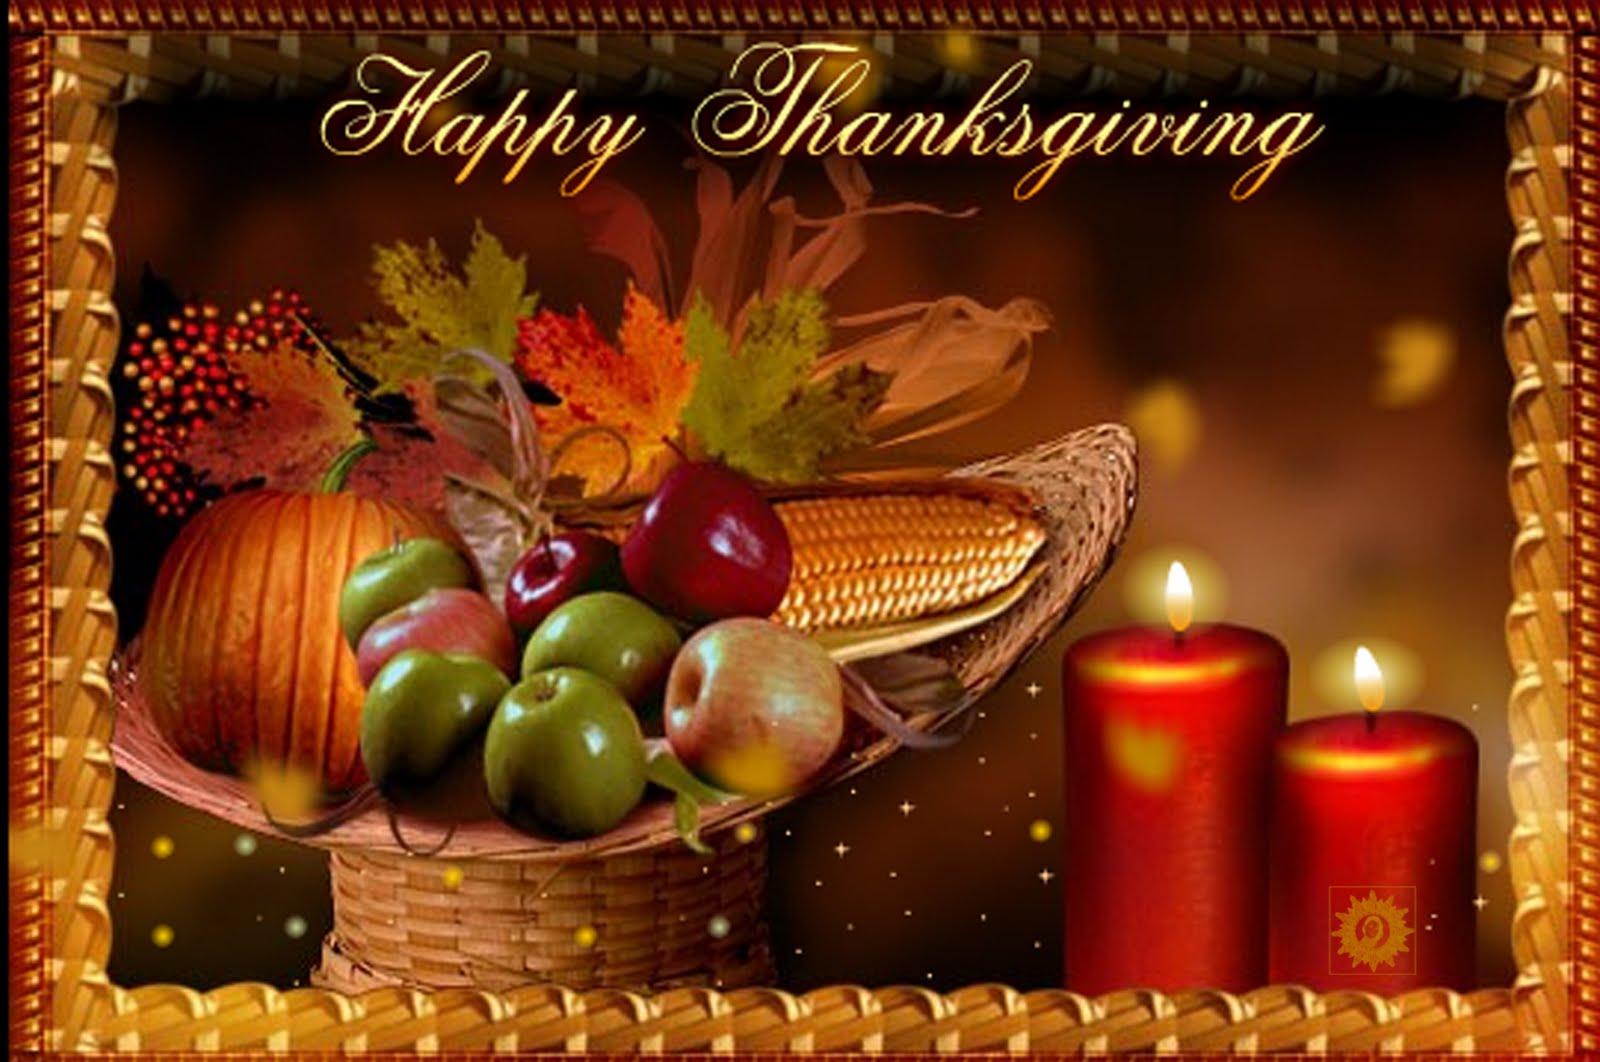 Thanksgiving Wallpapers Thanksgiving PC Wallpapers Thanksgiving PC 1600x1062